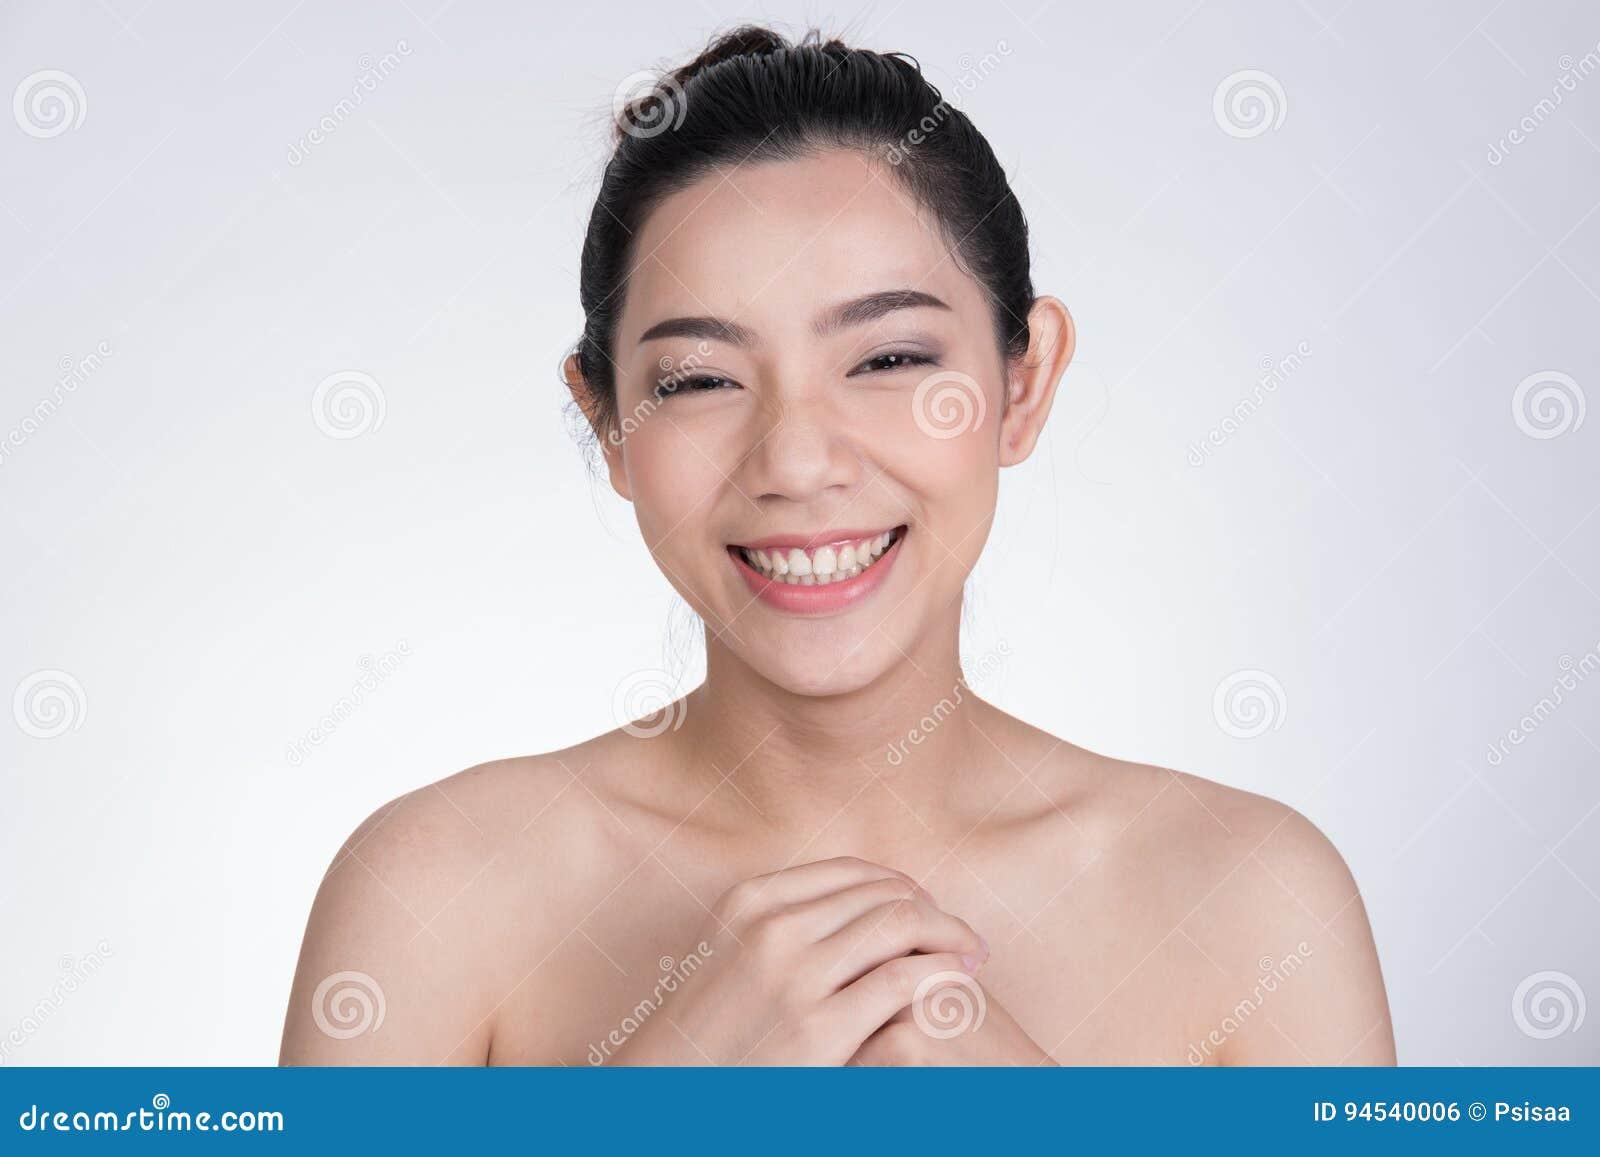 Small girl mature man porn